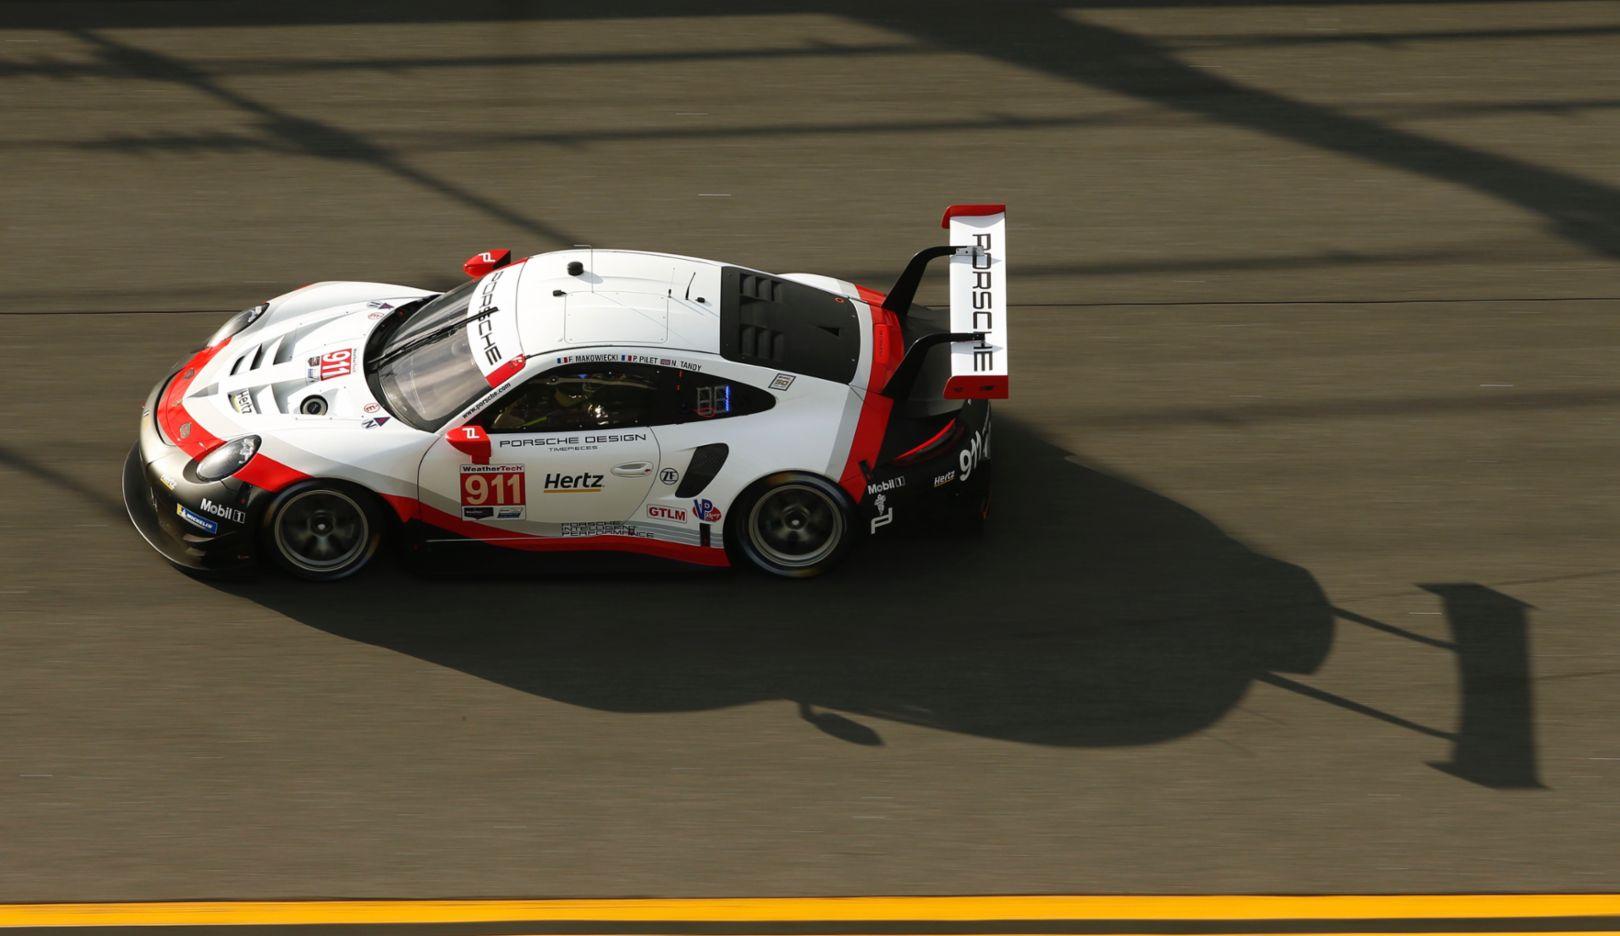 911 RSR, Porsche GT Team, IMSA WeatherTech SportsCar Championship, Test, Daytona, 2019, Porsche AG